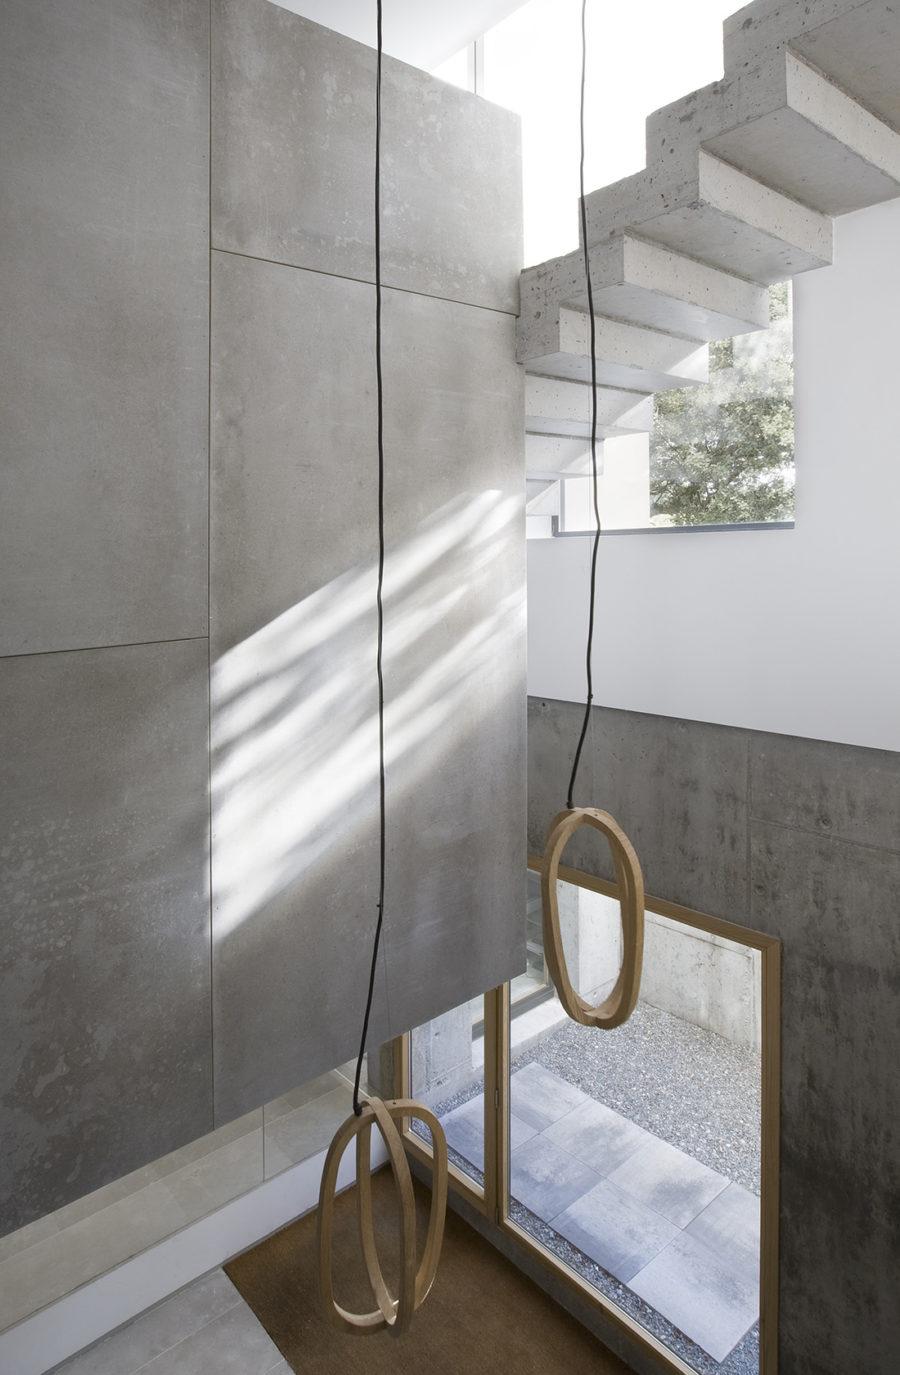 Detalle de la escalera peldañeada de hormigón doble, ÁBATON Arquitectura